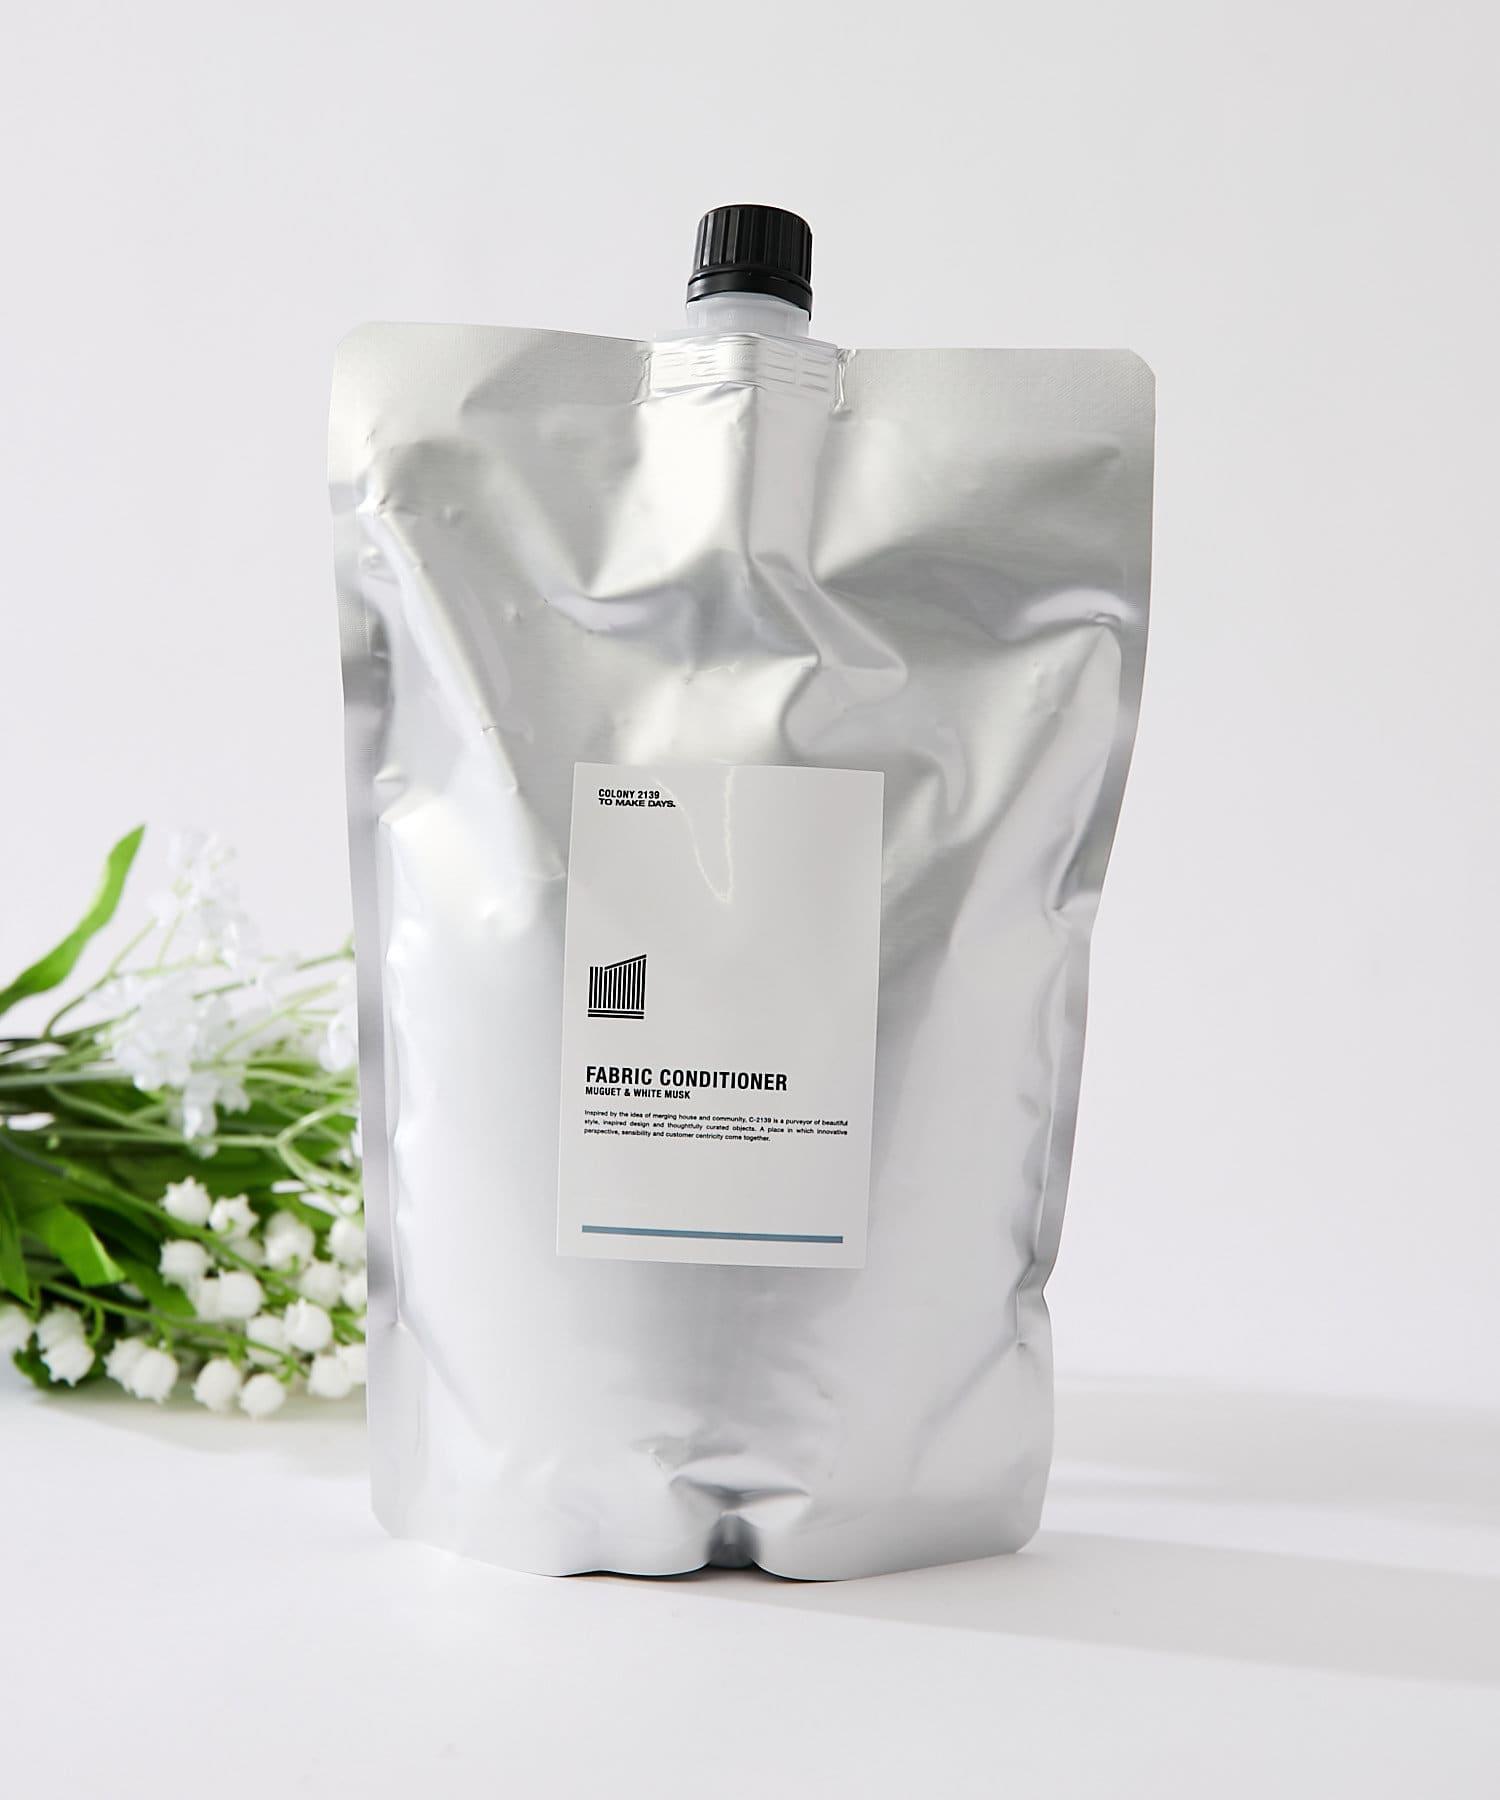 COLONY 2139(コロニー トゥーワンスリーナイン) 柔軟仕上剤詰替用1000ml(ミュゲ&ホワイトムスクの香り)